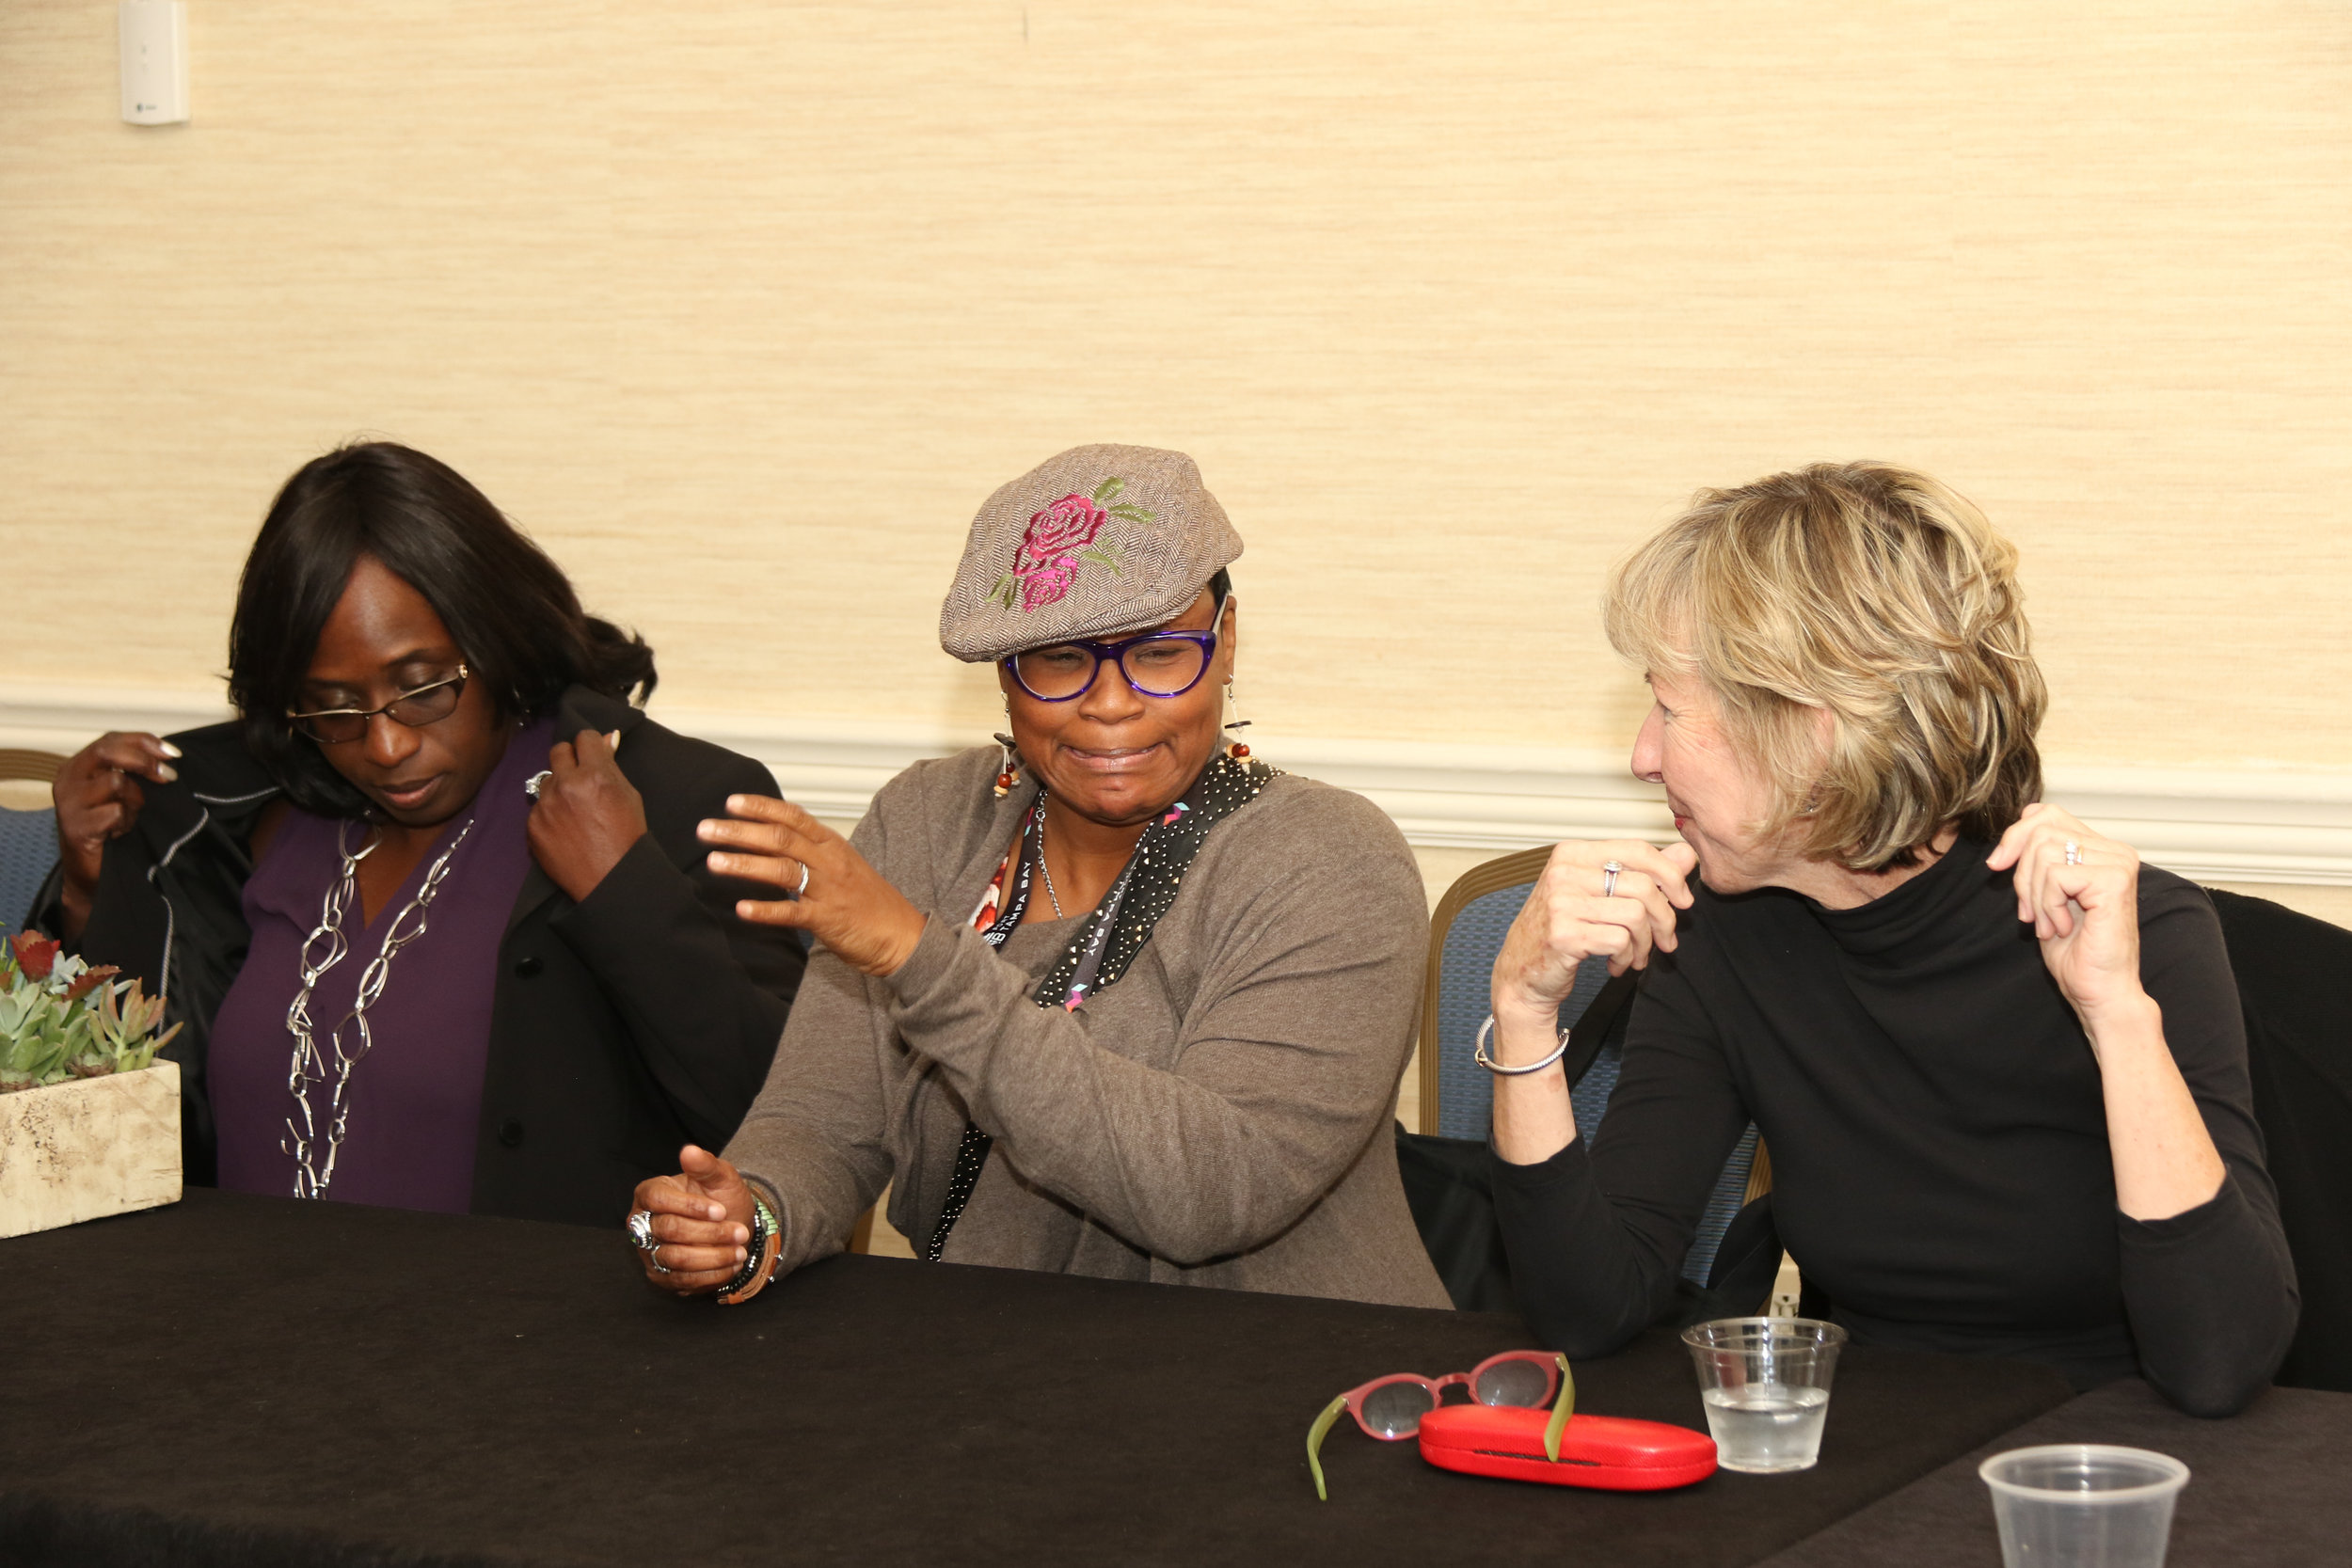 624_WomensConference_10-27-17.jpg